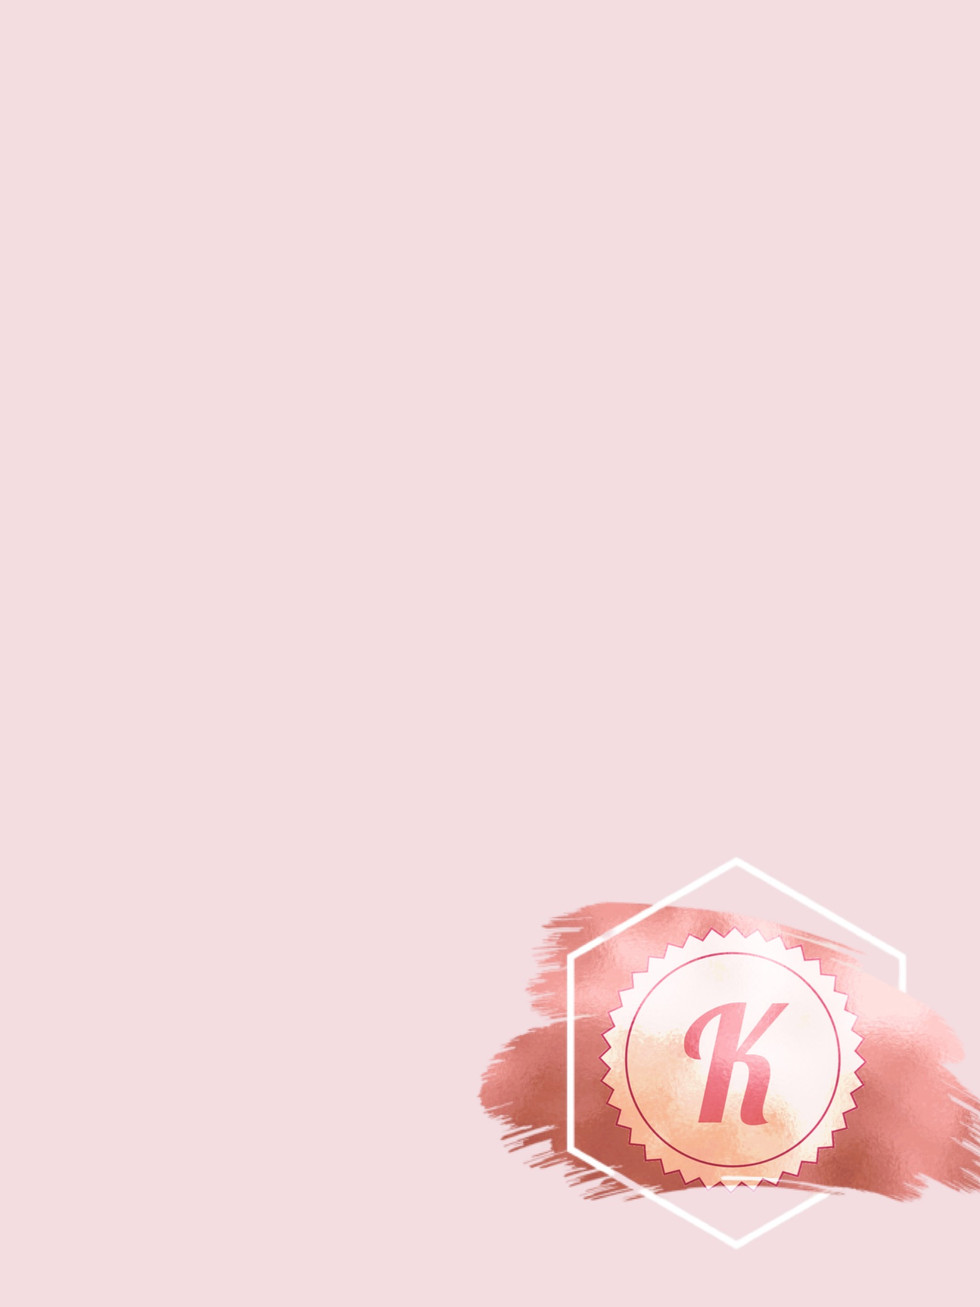 IMG_1754 2.JPG